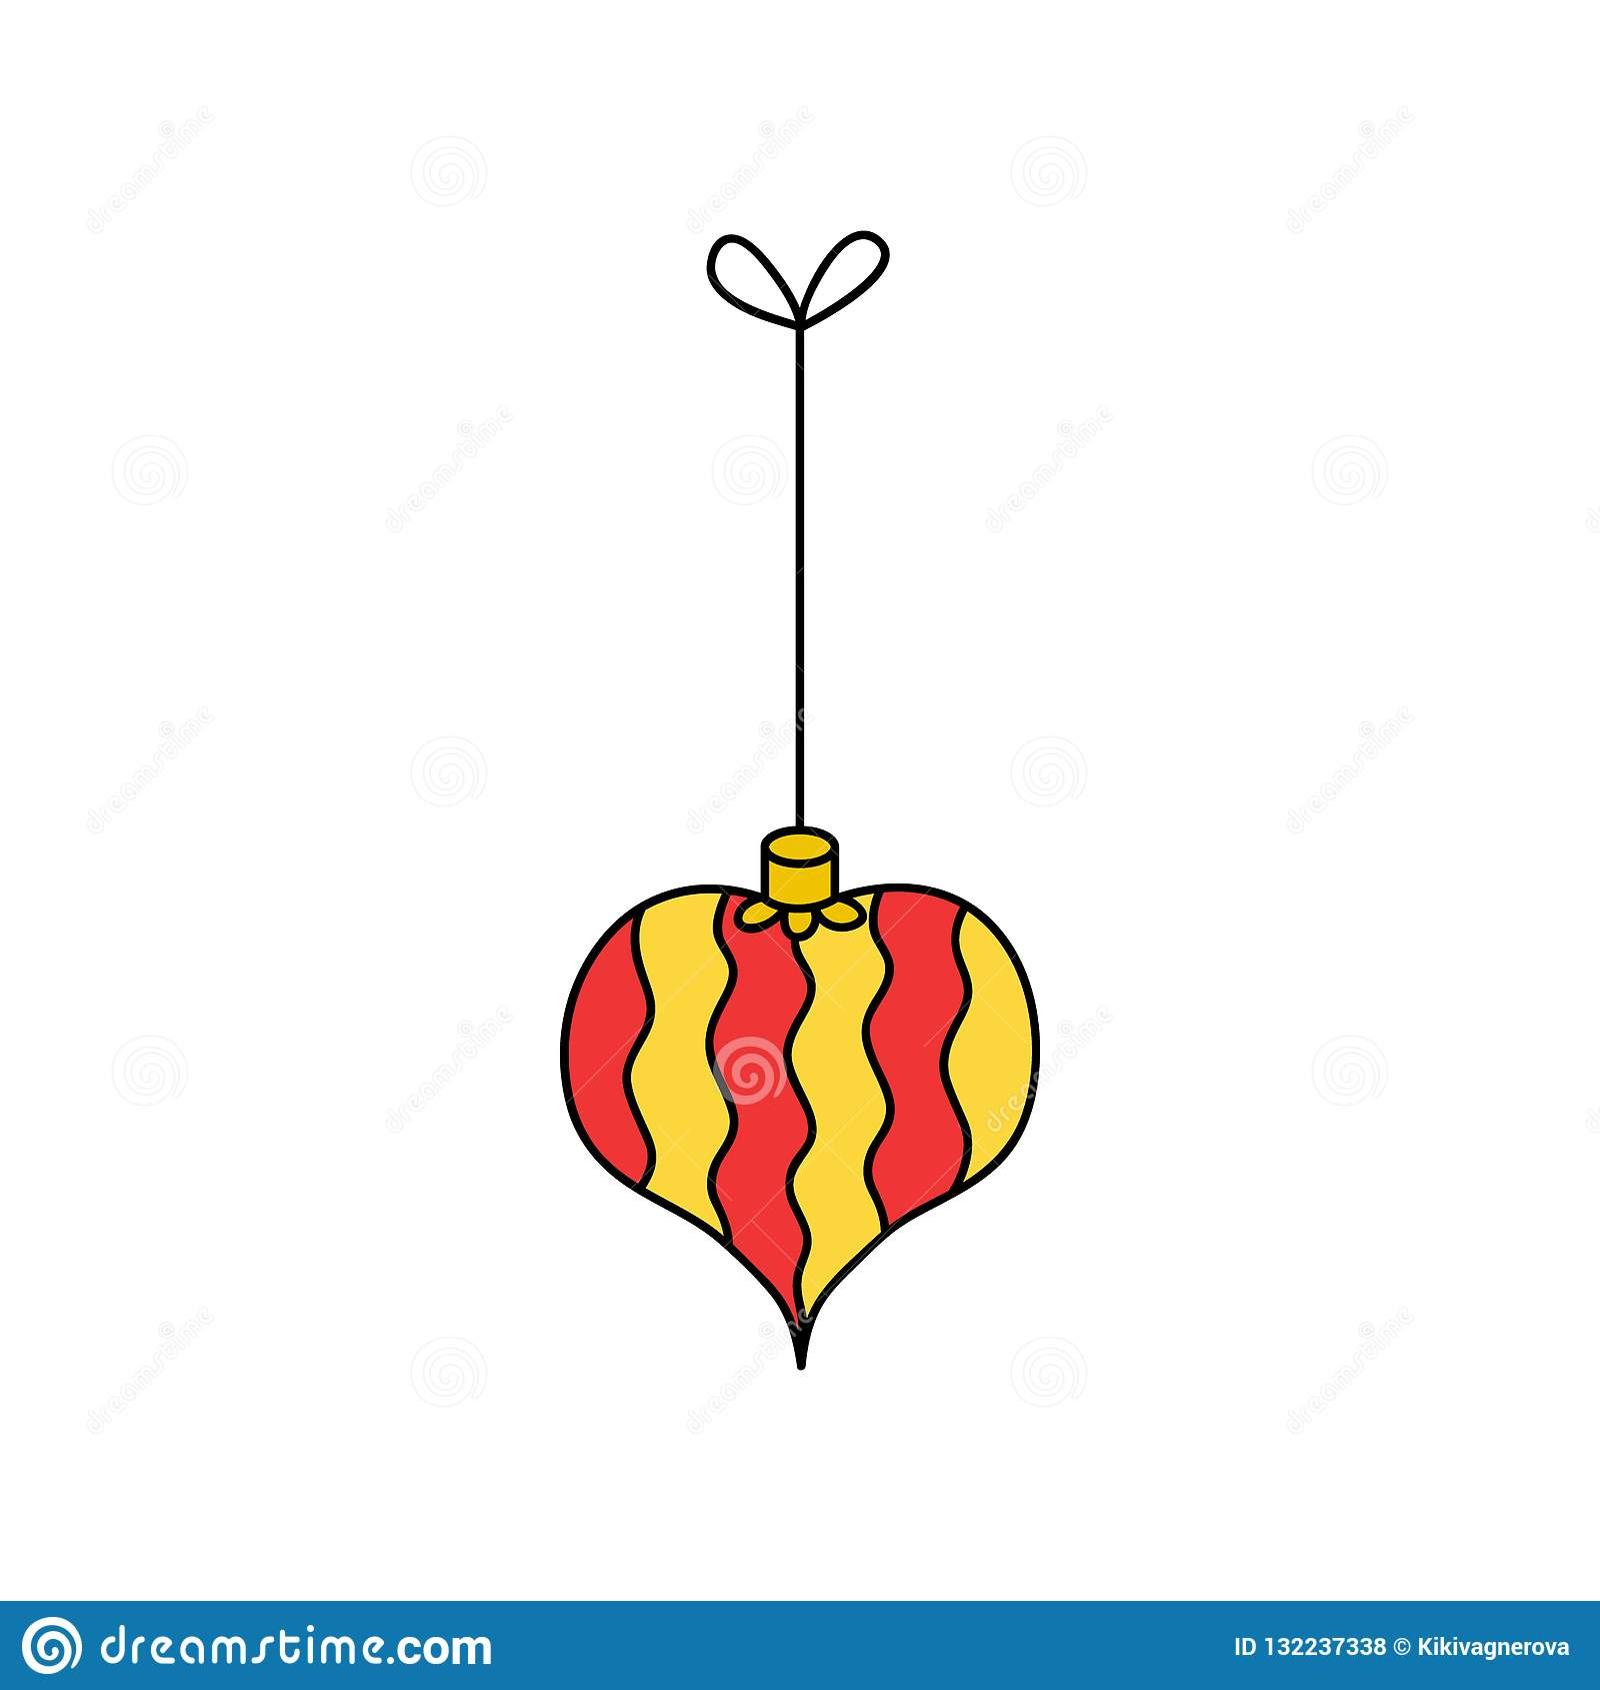 Christmas Heart Vector.Christmas Heart Ornament Vector Illustration Icon Stock